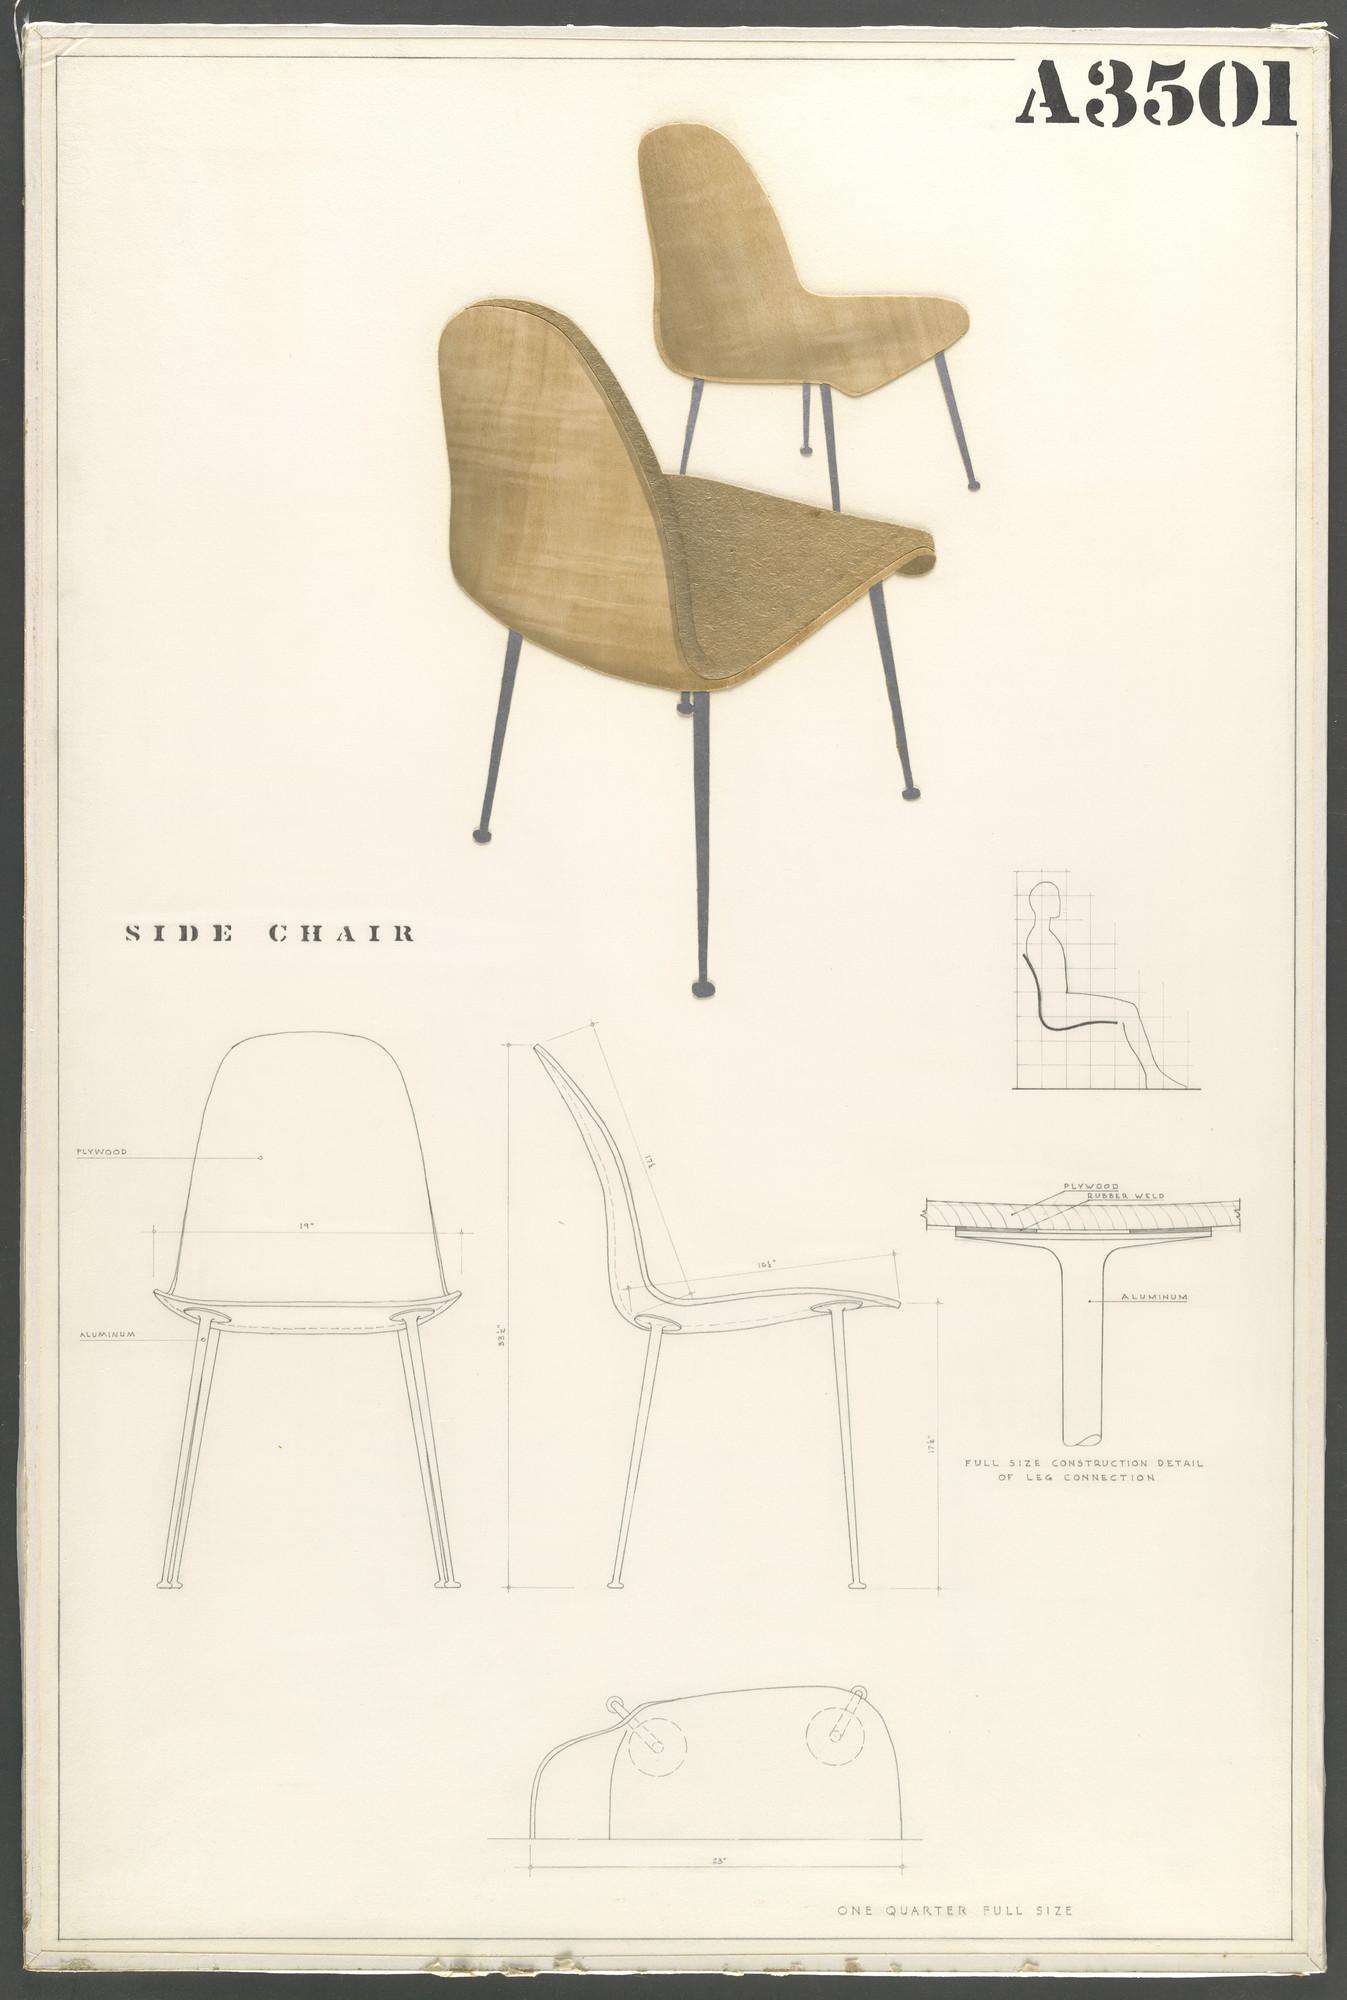 saarinen organic chair. Charles Eames, Eero Saarinen Side Chair (Entry Panel For MoMA Competition Organic Design In Home Furnishings) 1940 U